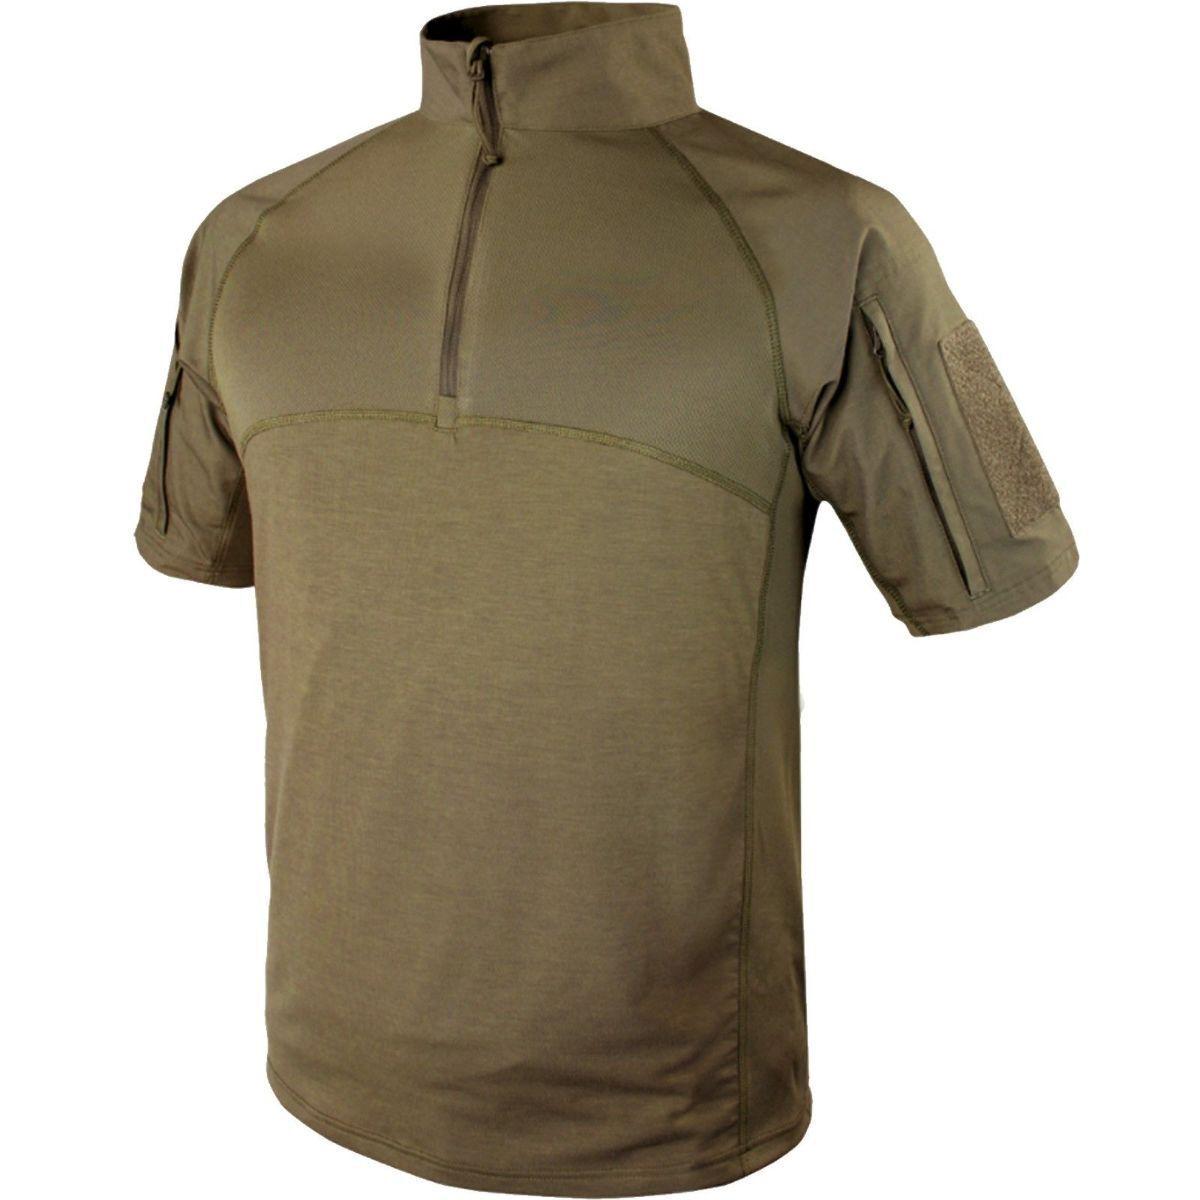 Condor Short Sleeve Combat Shirt - Tan - Small -  New - 101144-003-S  fashionable